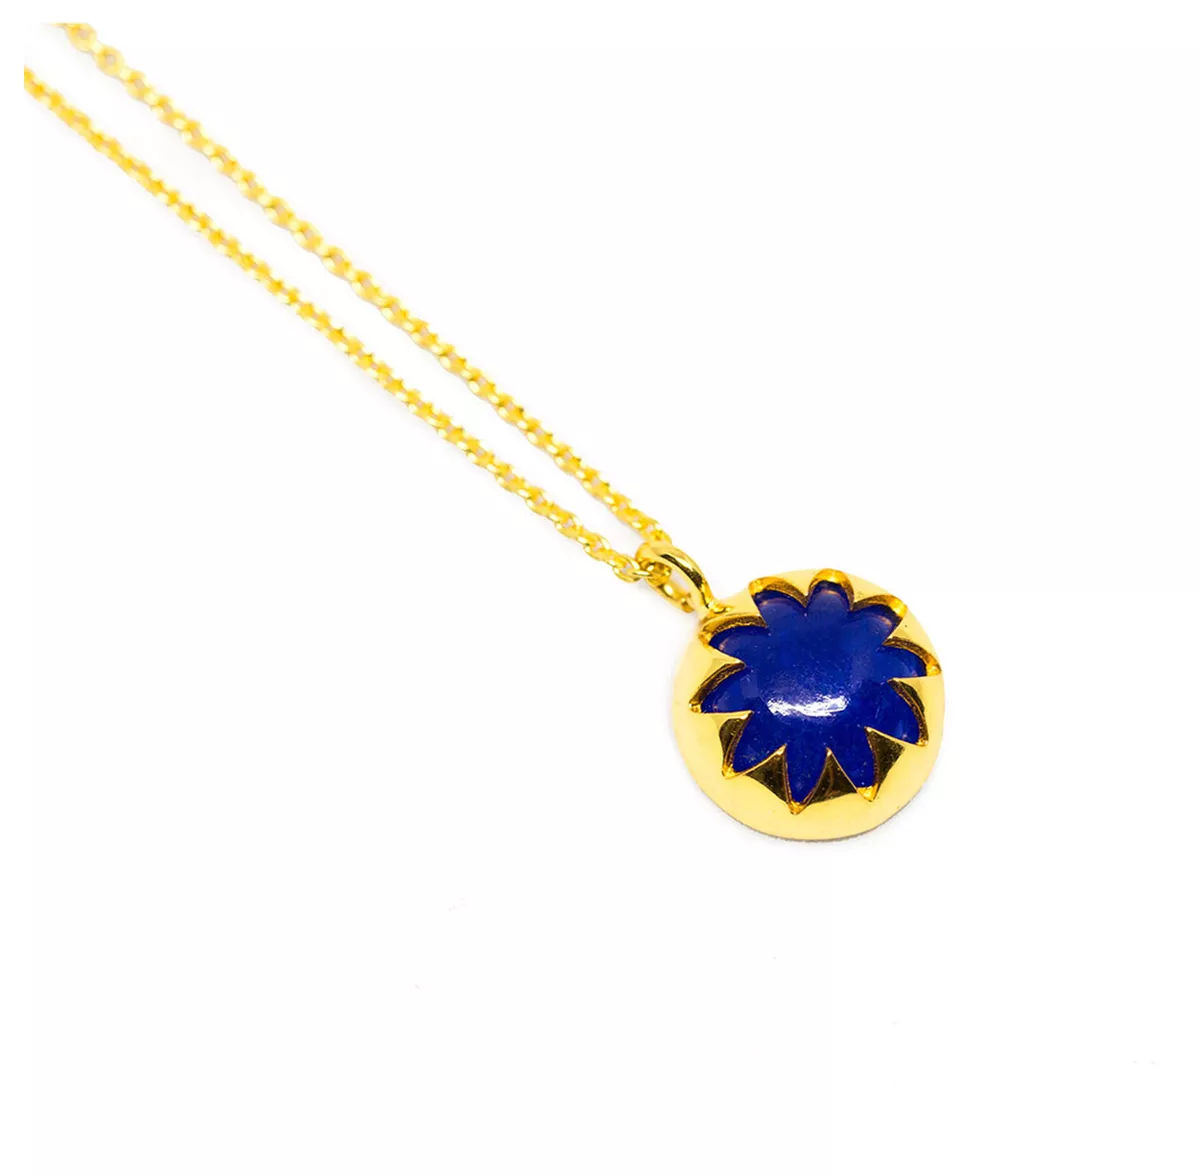 Buy myo designs natural blue pendant myo designsblue quartz pendant aloadofball Gallery